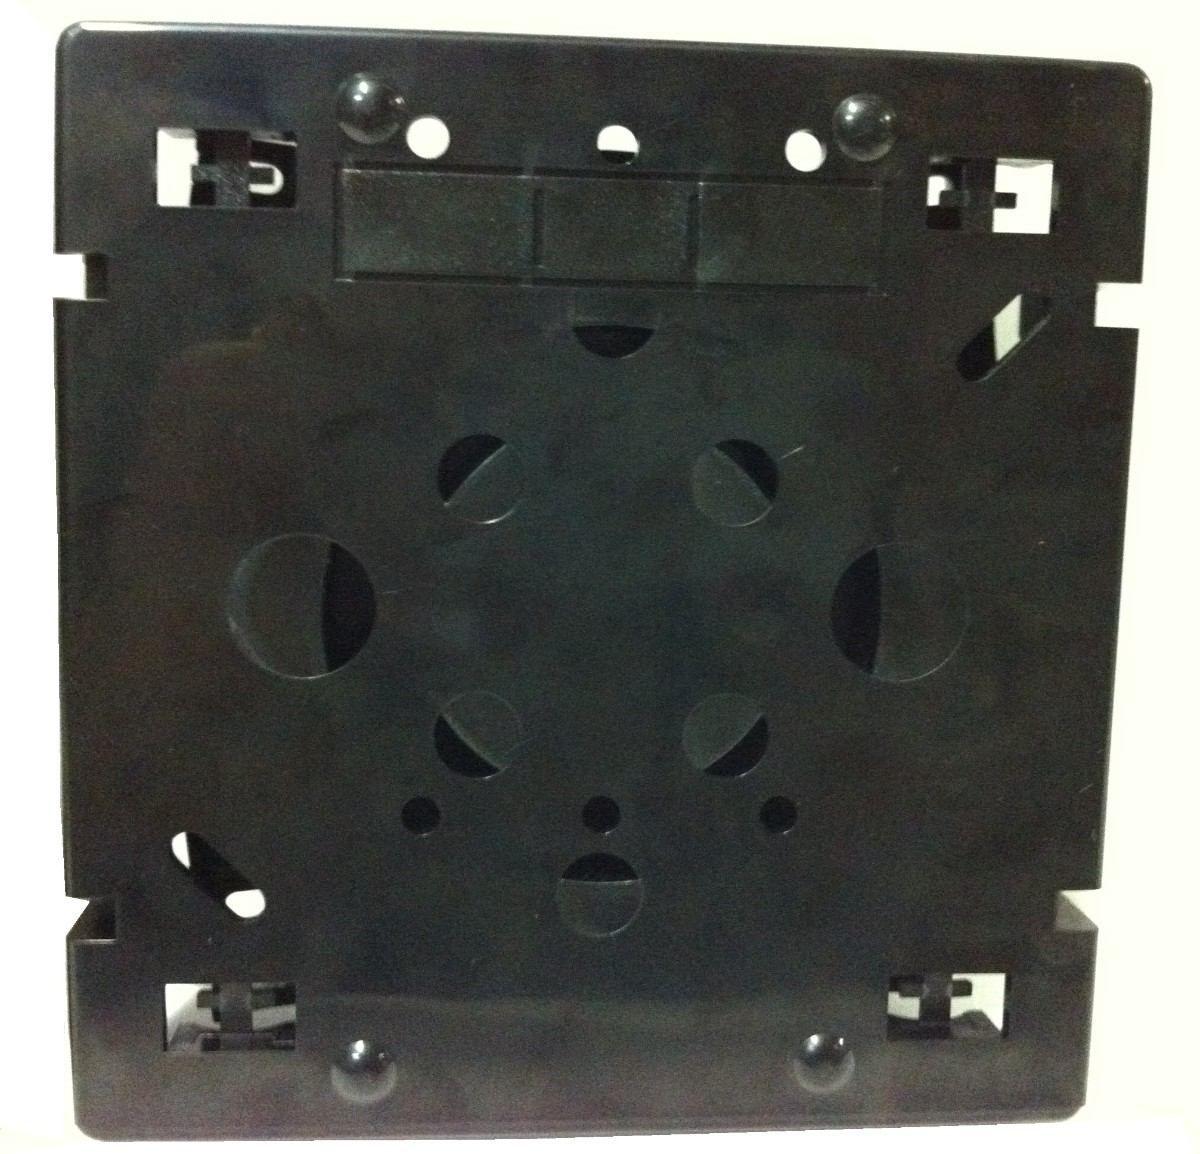 50 unidades Caixa de Emenda Óptic-Block 12F - Terminador óptico de PVC quadrado